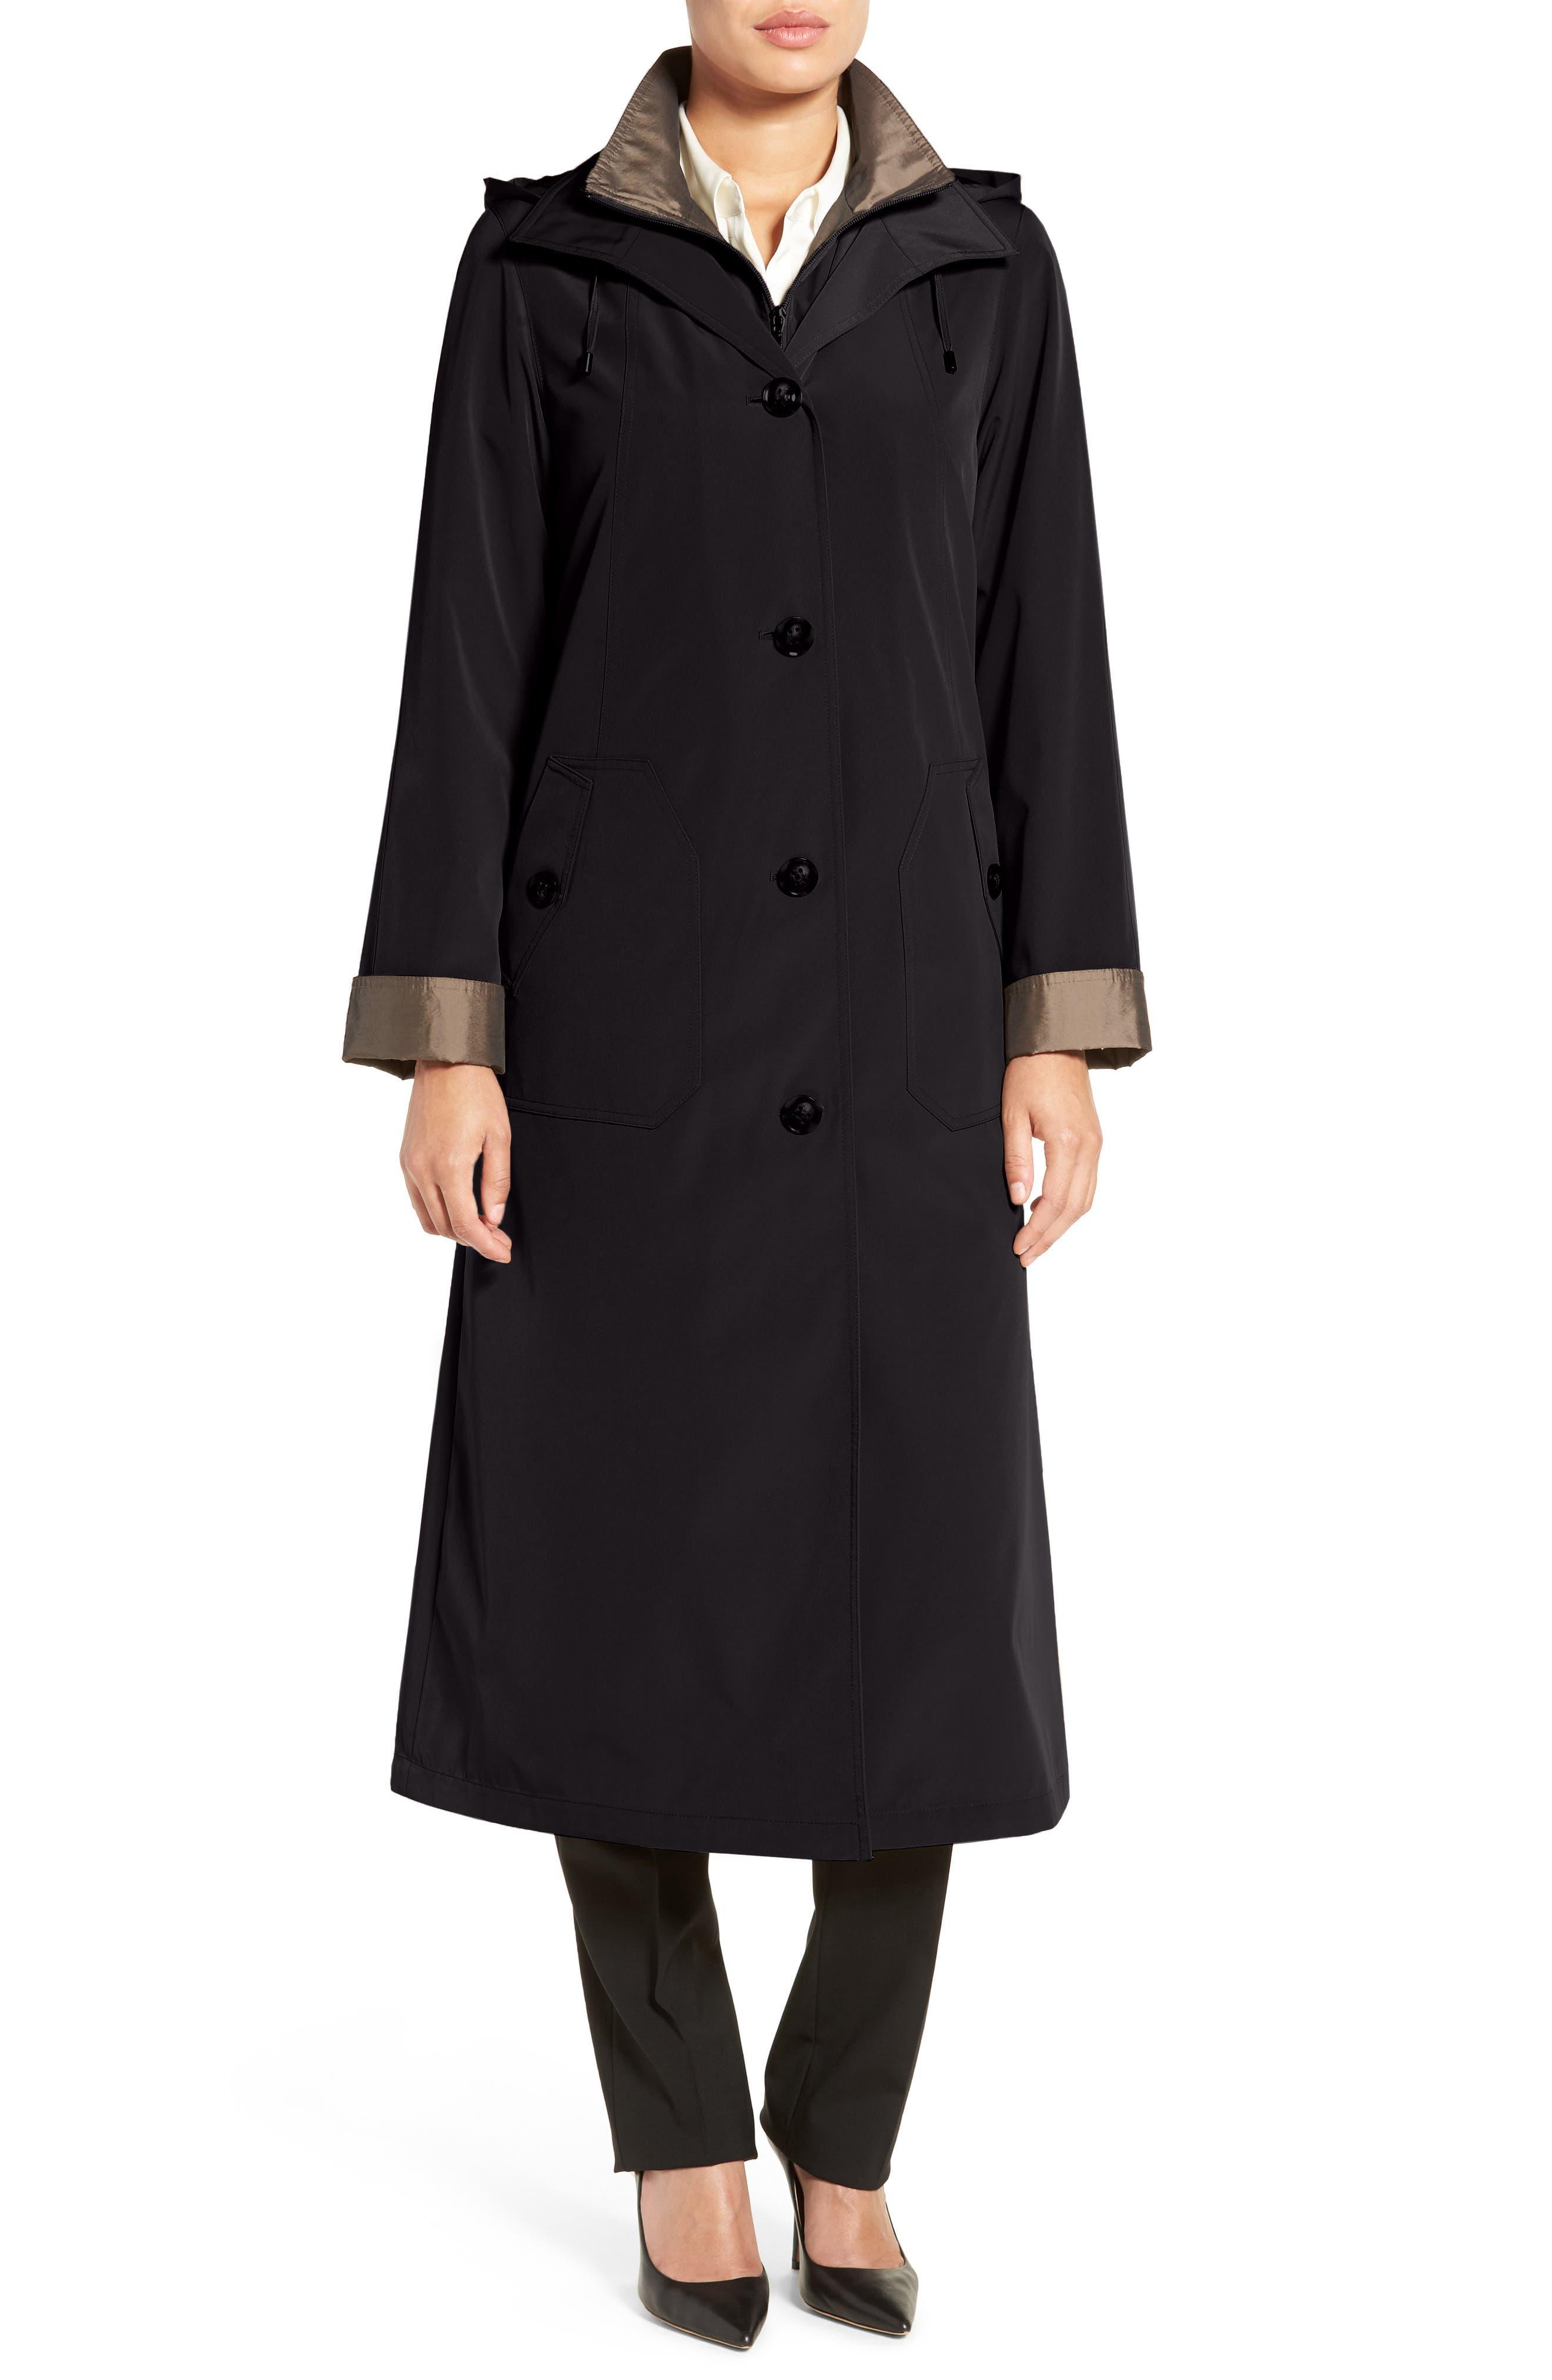 Full Length Two-Tone Silk Look Raincoat,                             Main thumbnail 1, color,                             Black/ Bronze